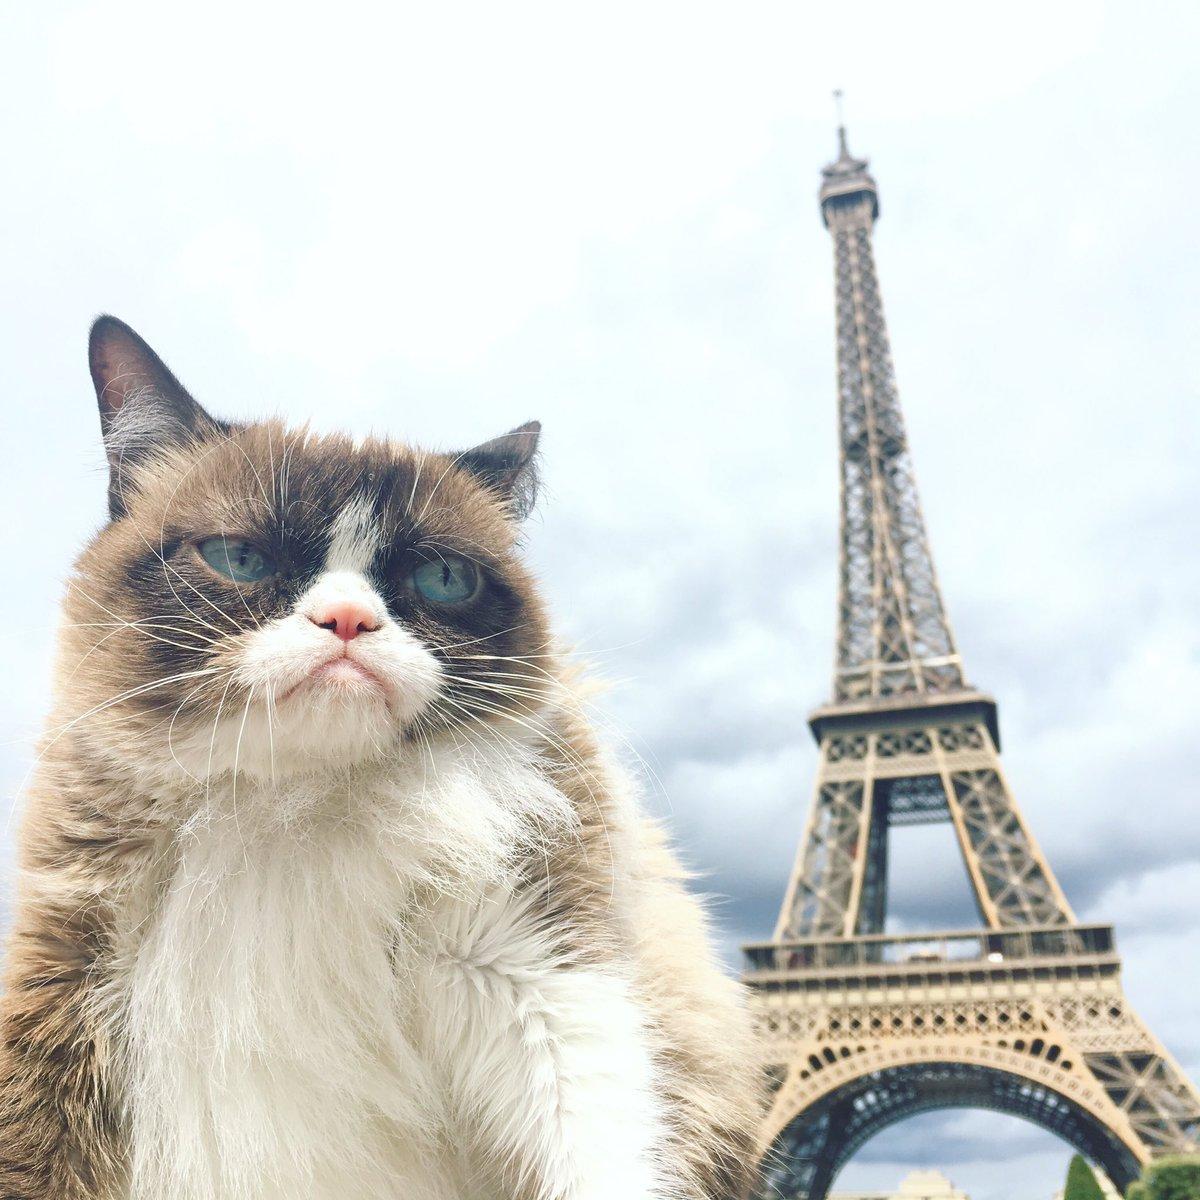 Who Is Grumpy Cat